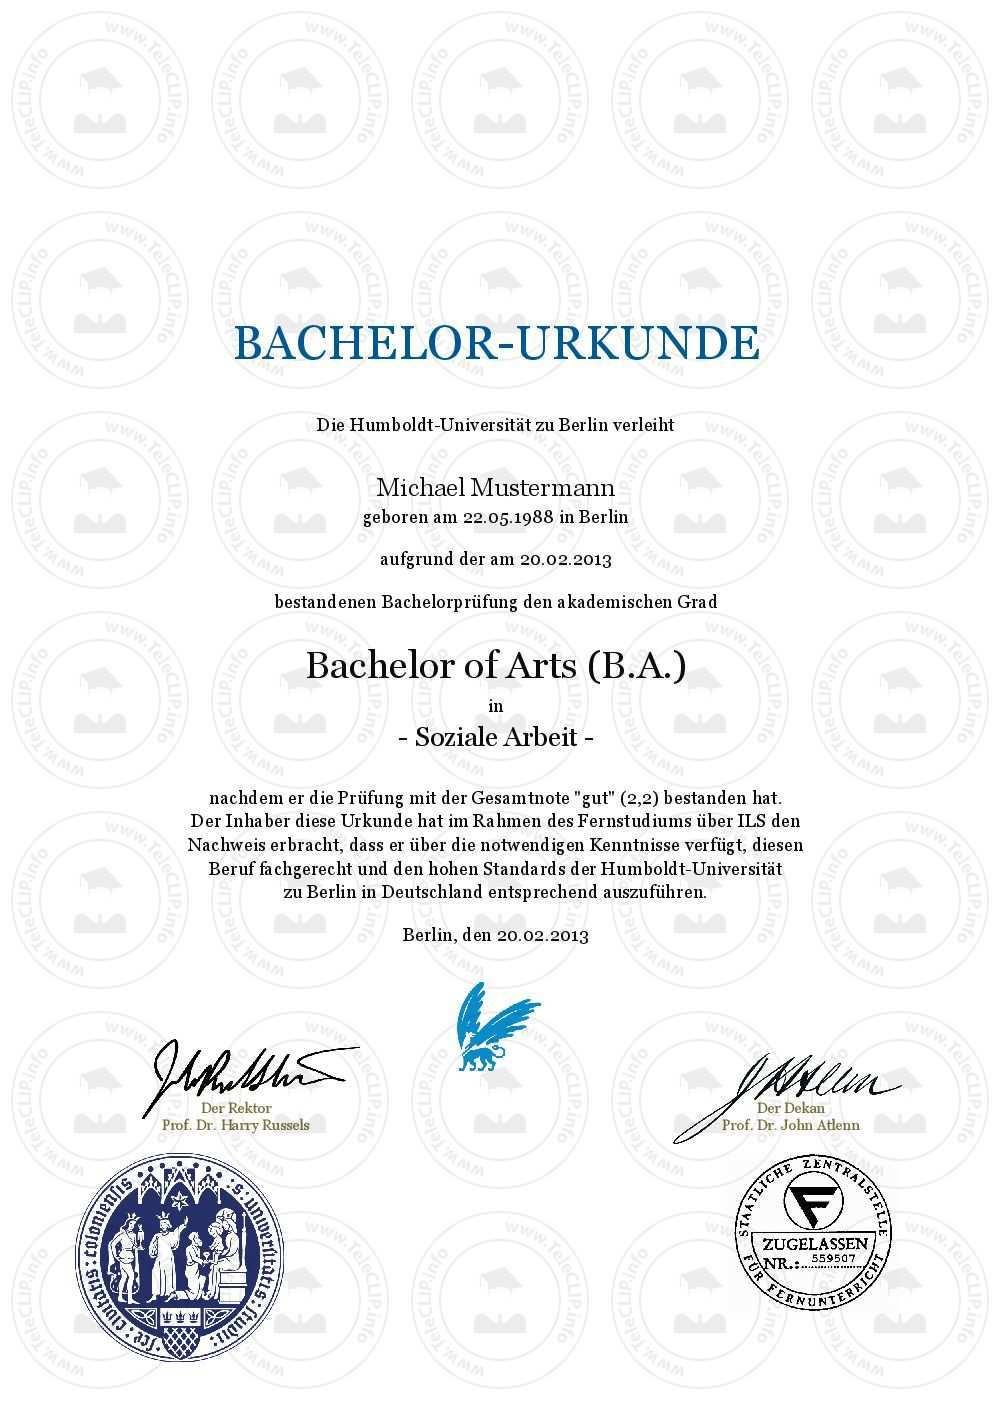 Bachelor Urkunde Humboldt Universitat Zu Berlin Reproduktion Nach Aktueller Vorlage Bachelor Urkunde Einfach Online Kaufen Hum Bachelor Meisterbrief Urkunde